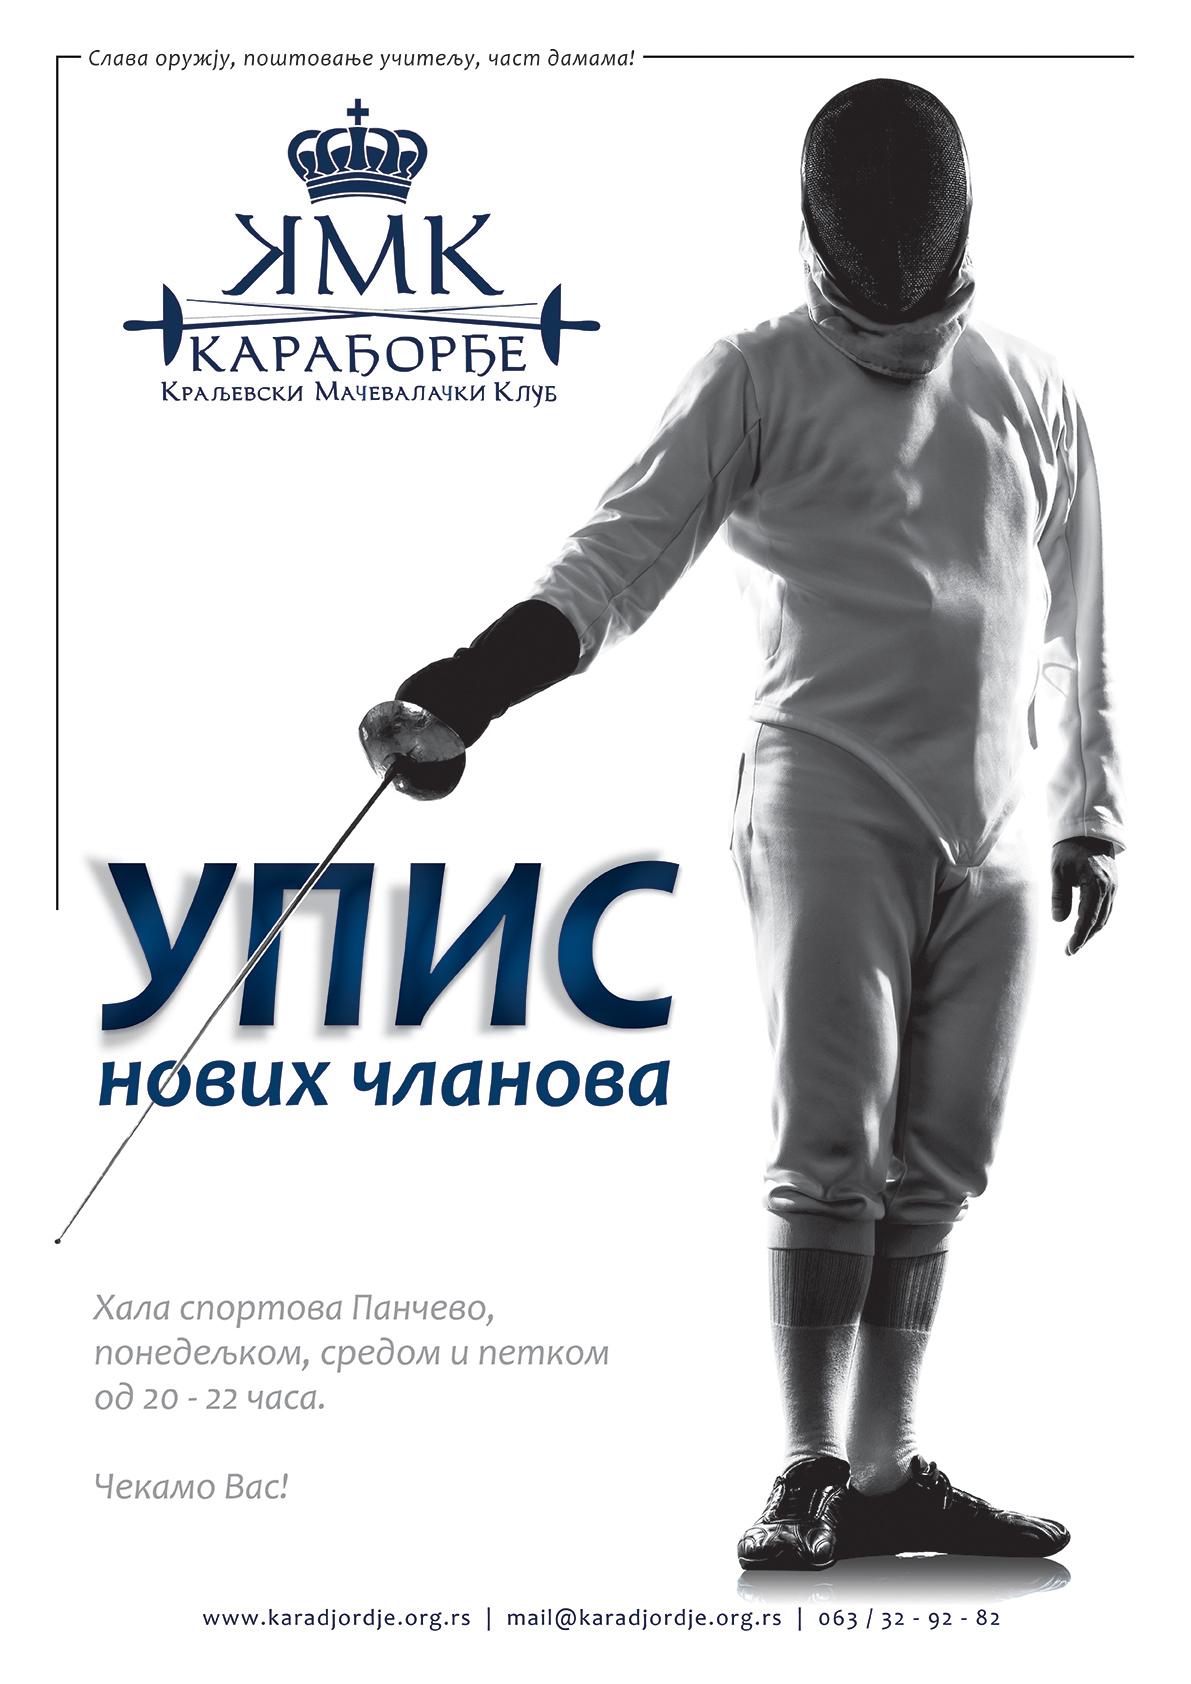 KMK Plakat BOJA - prikaz